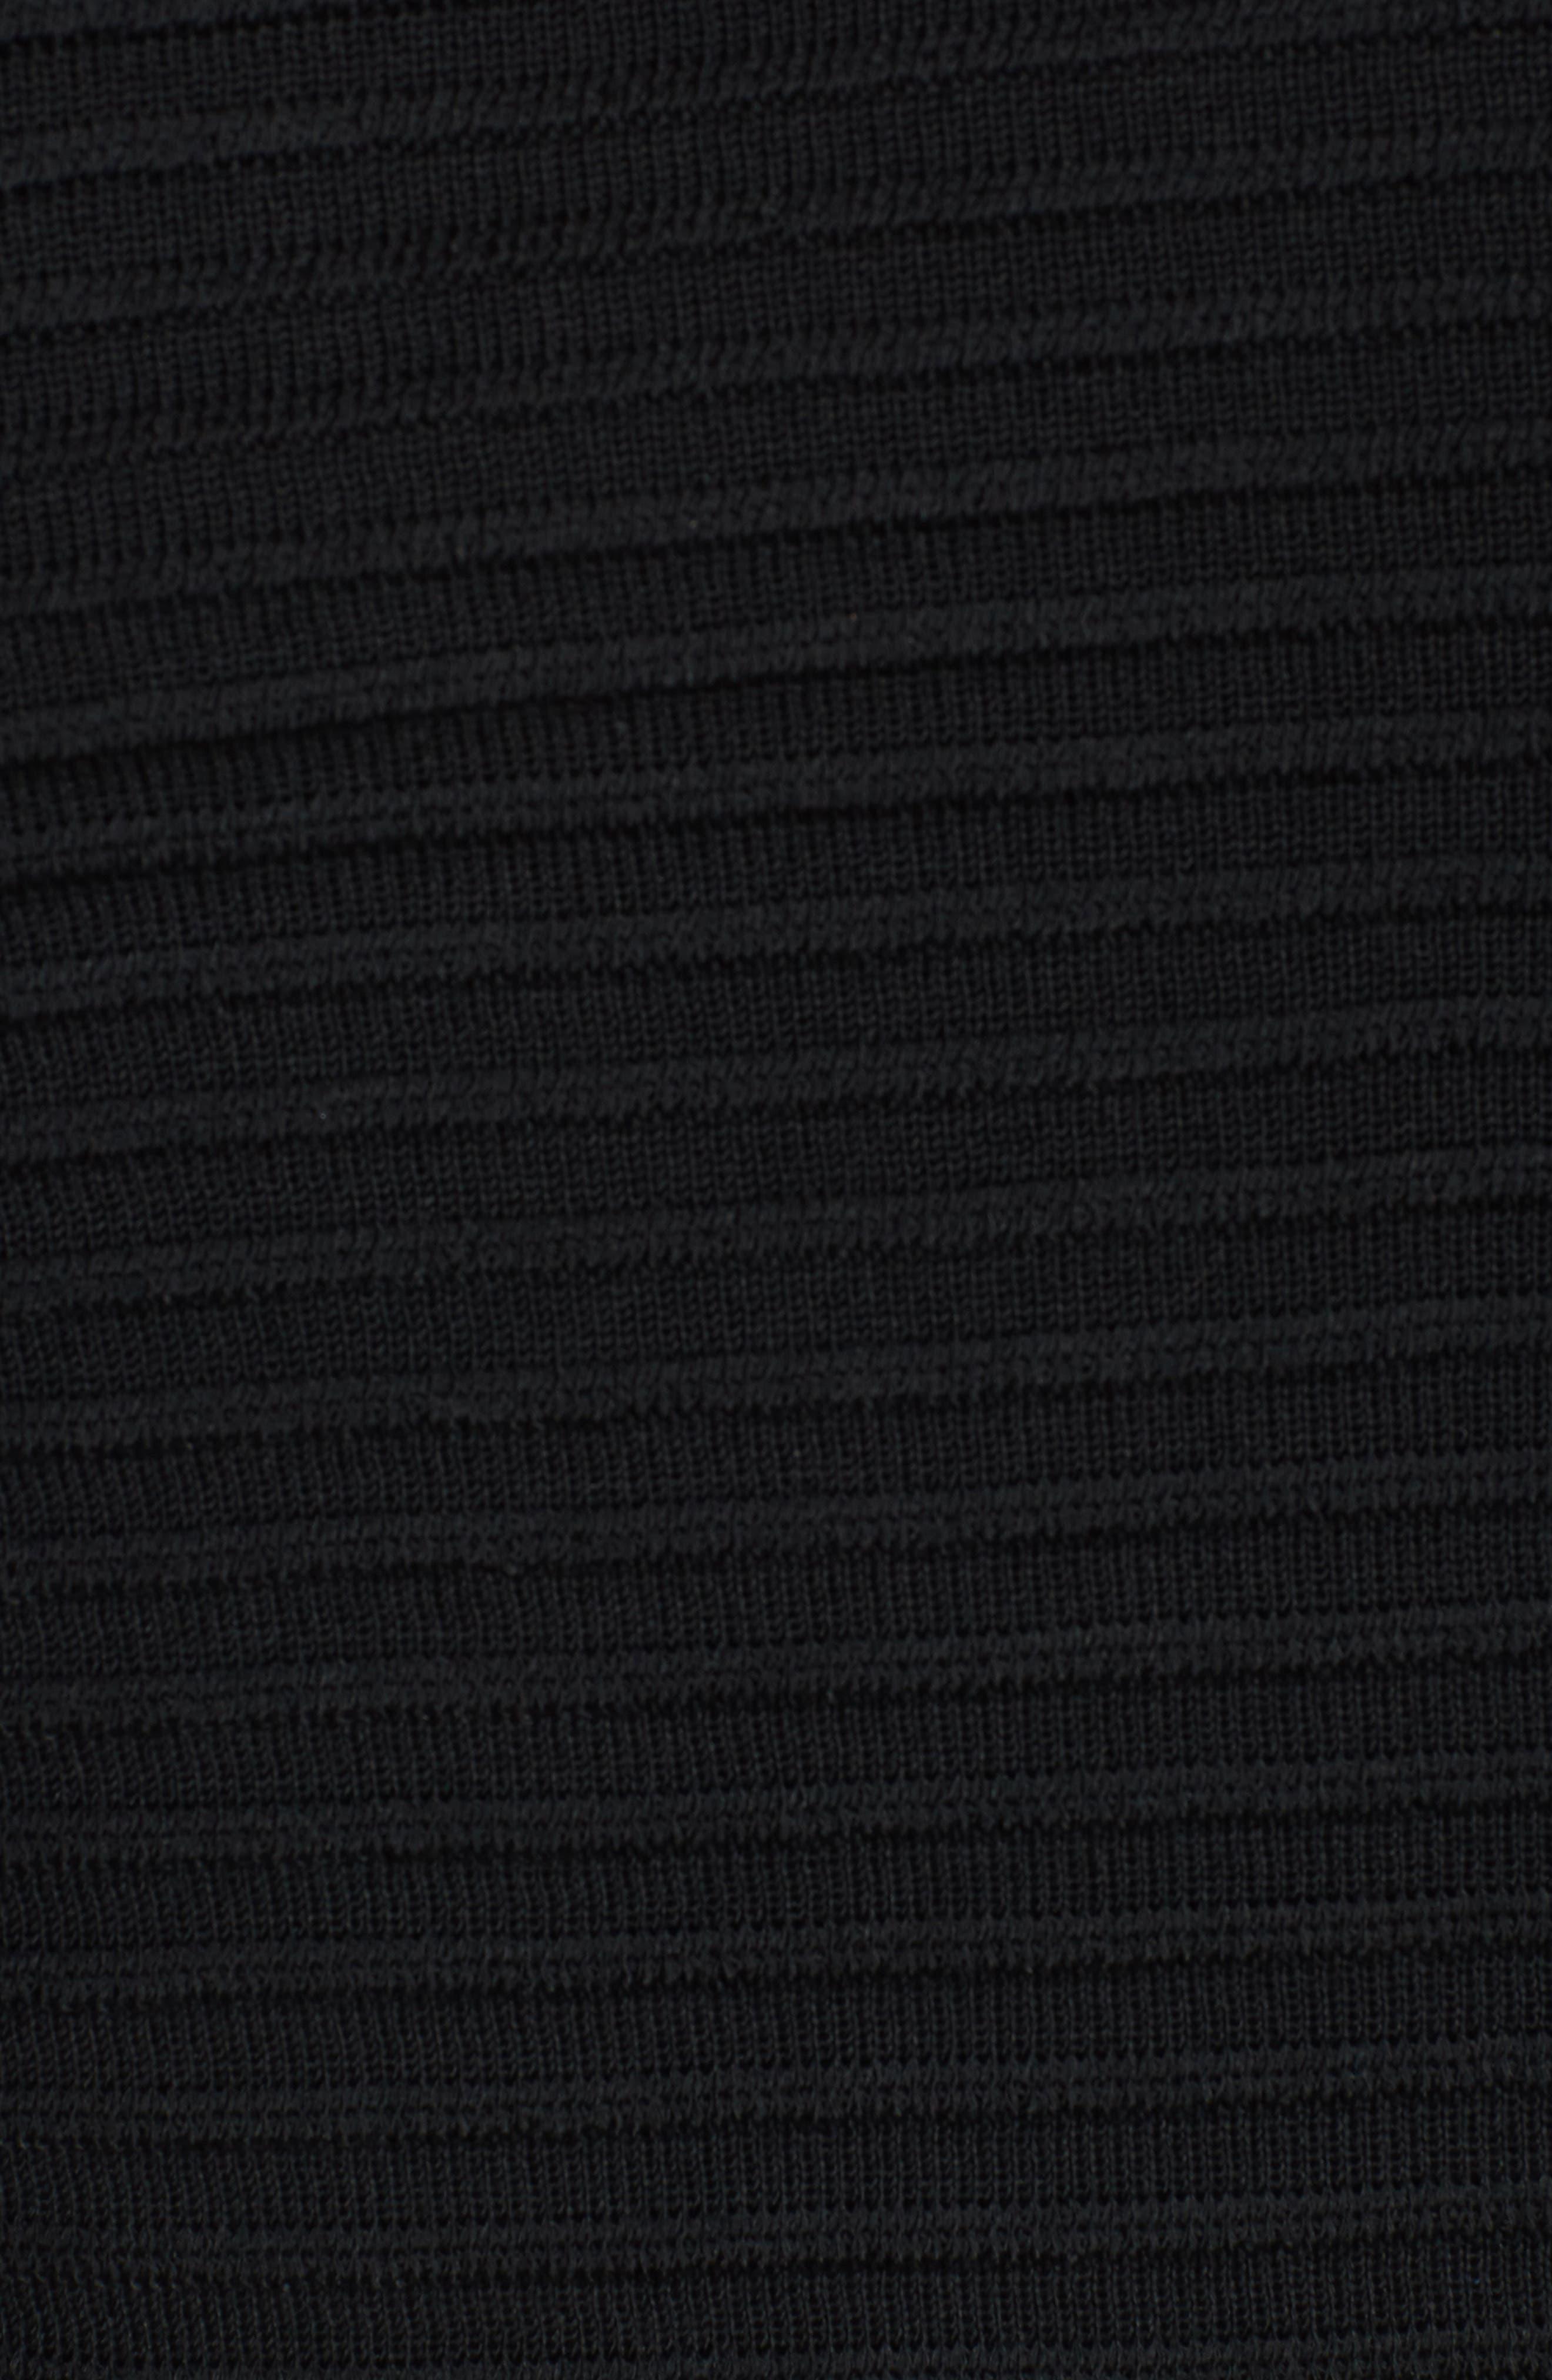 Ribbed Knit Jacket,                             Alternate thumbnail 5, color,                             Black